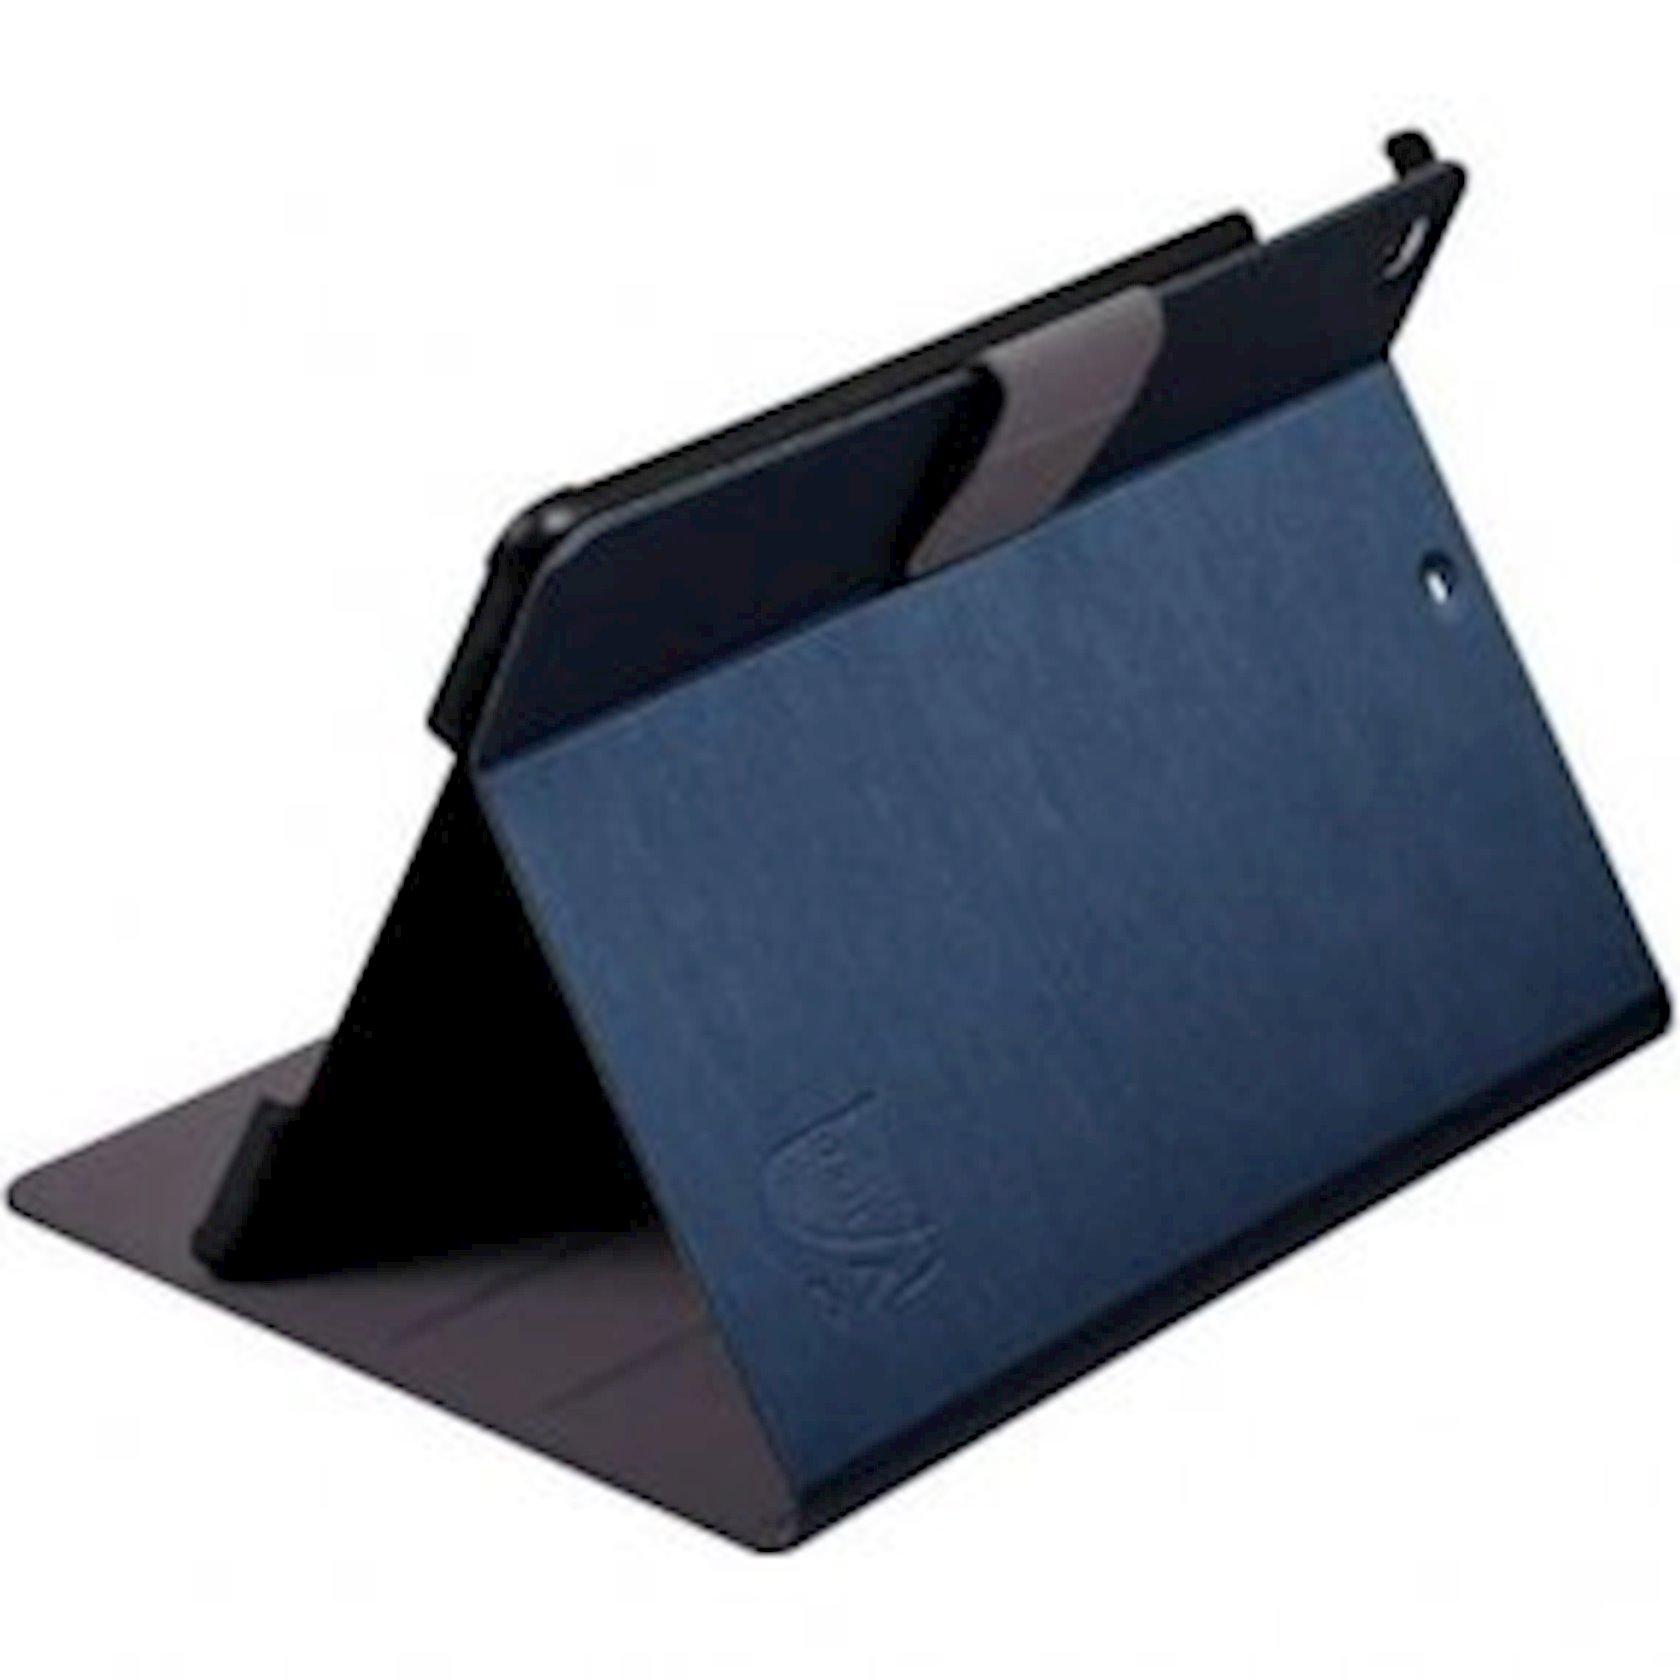 Planşet üçün çexol Port Designs Nagano Rotative iPad Air Göy